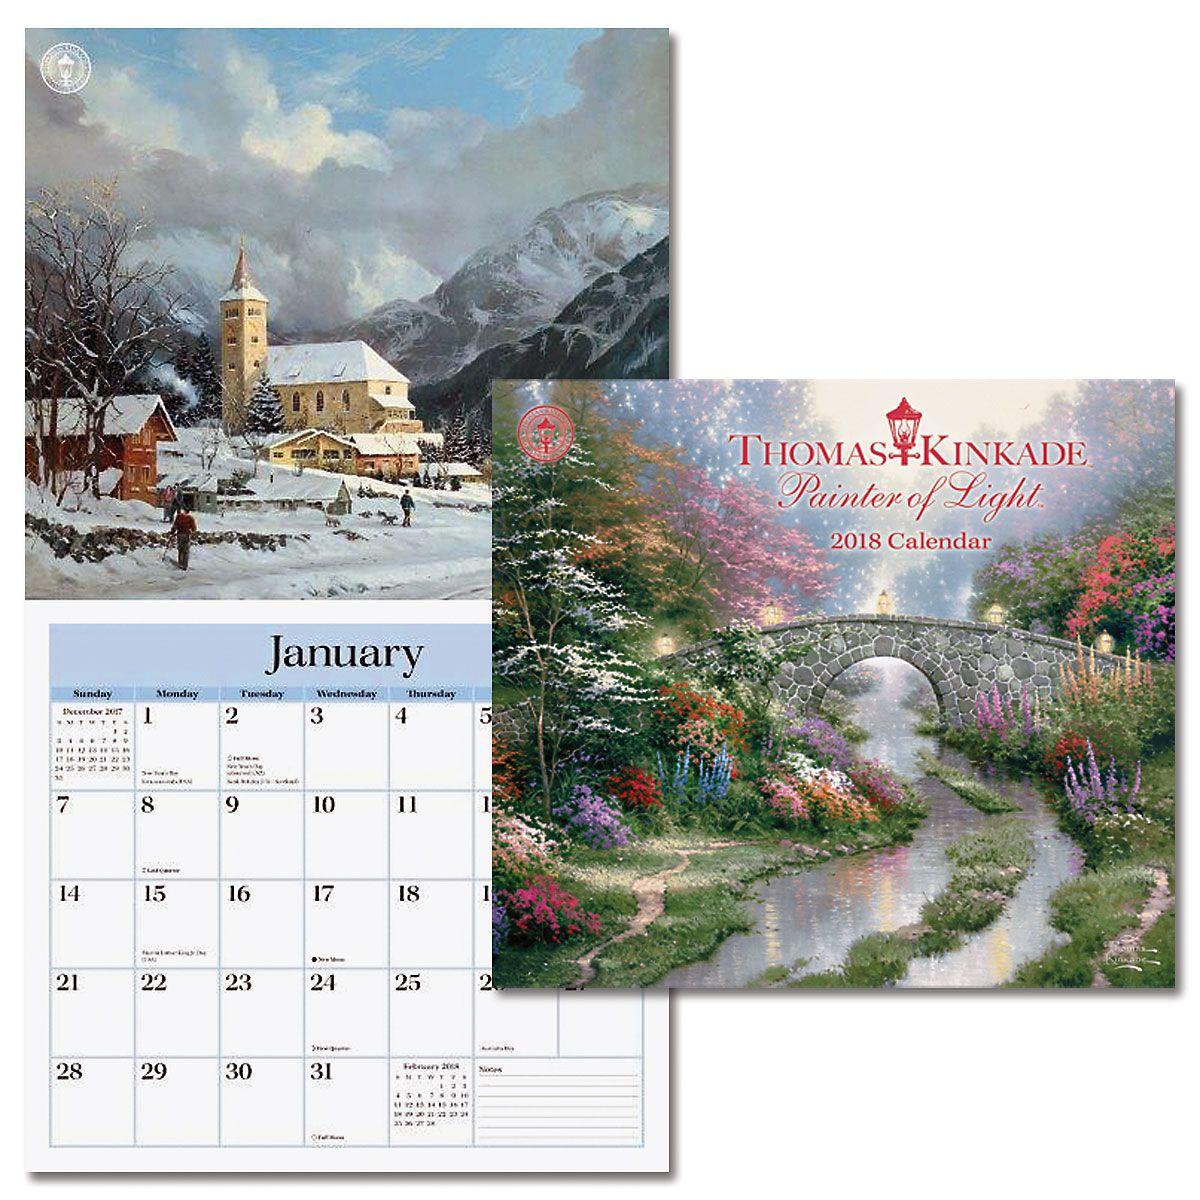 2018 Thomas Kinkade Painter of Light™ Deluxe Wall Calendar